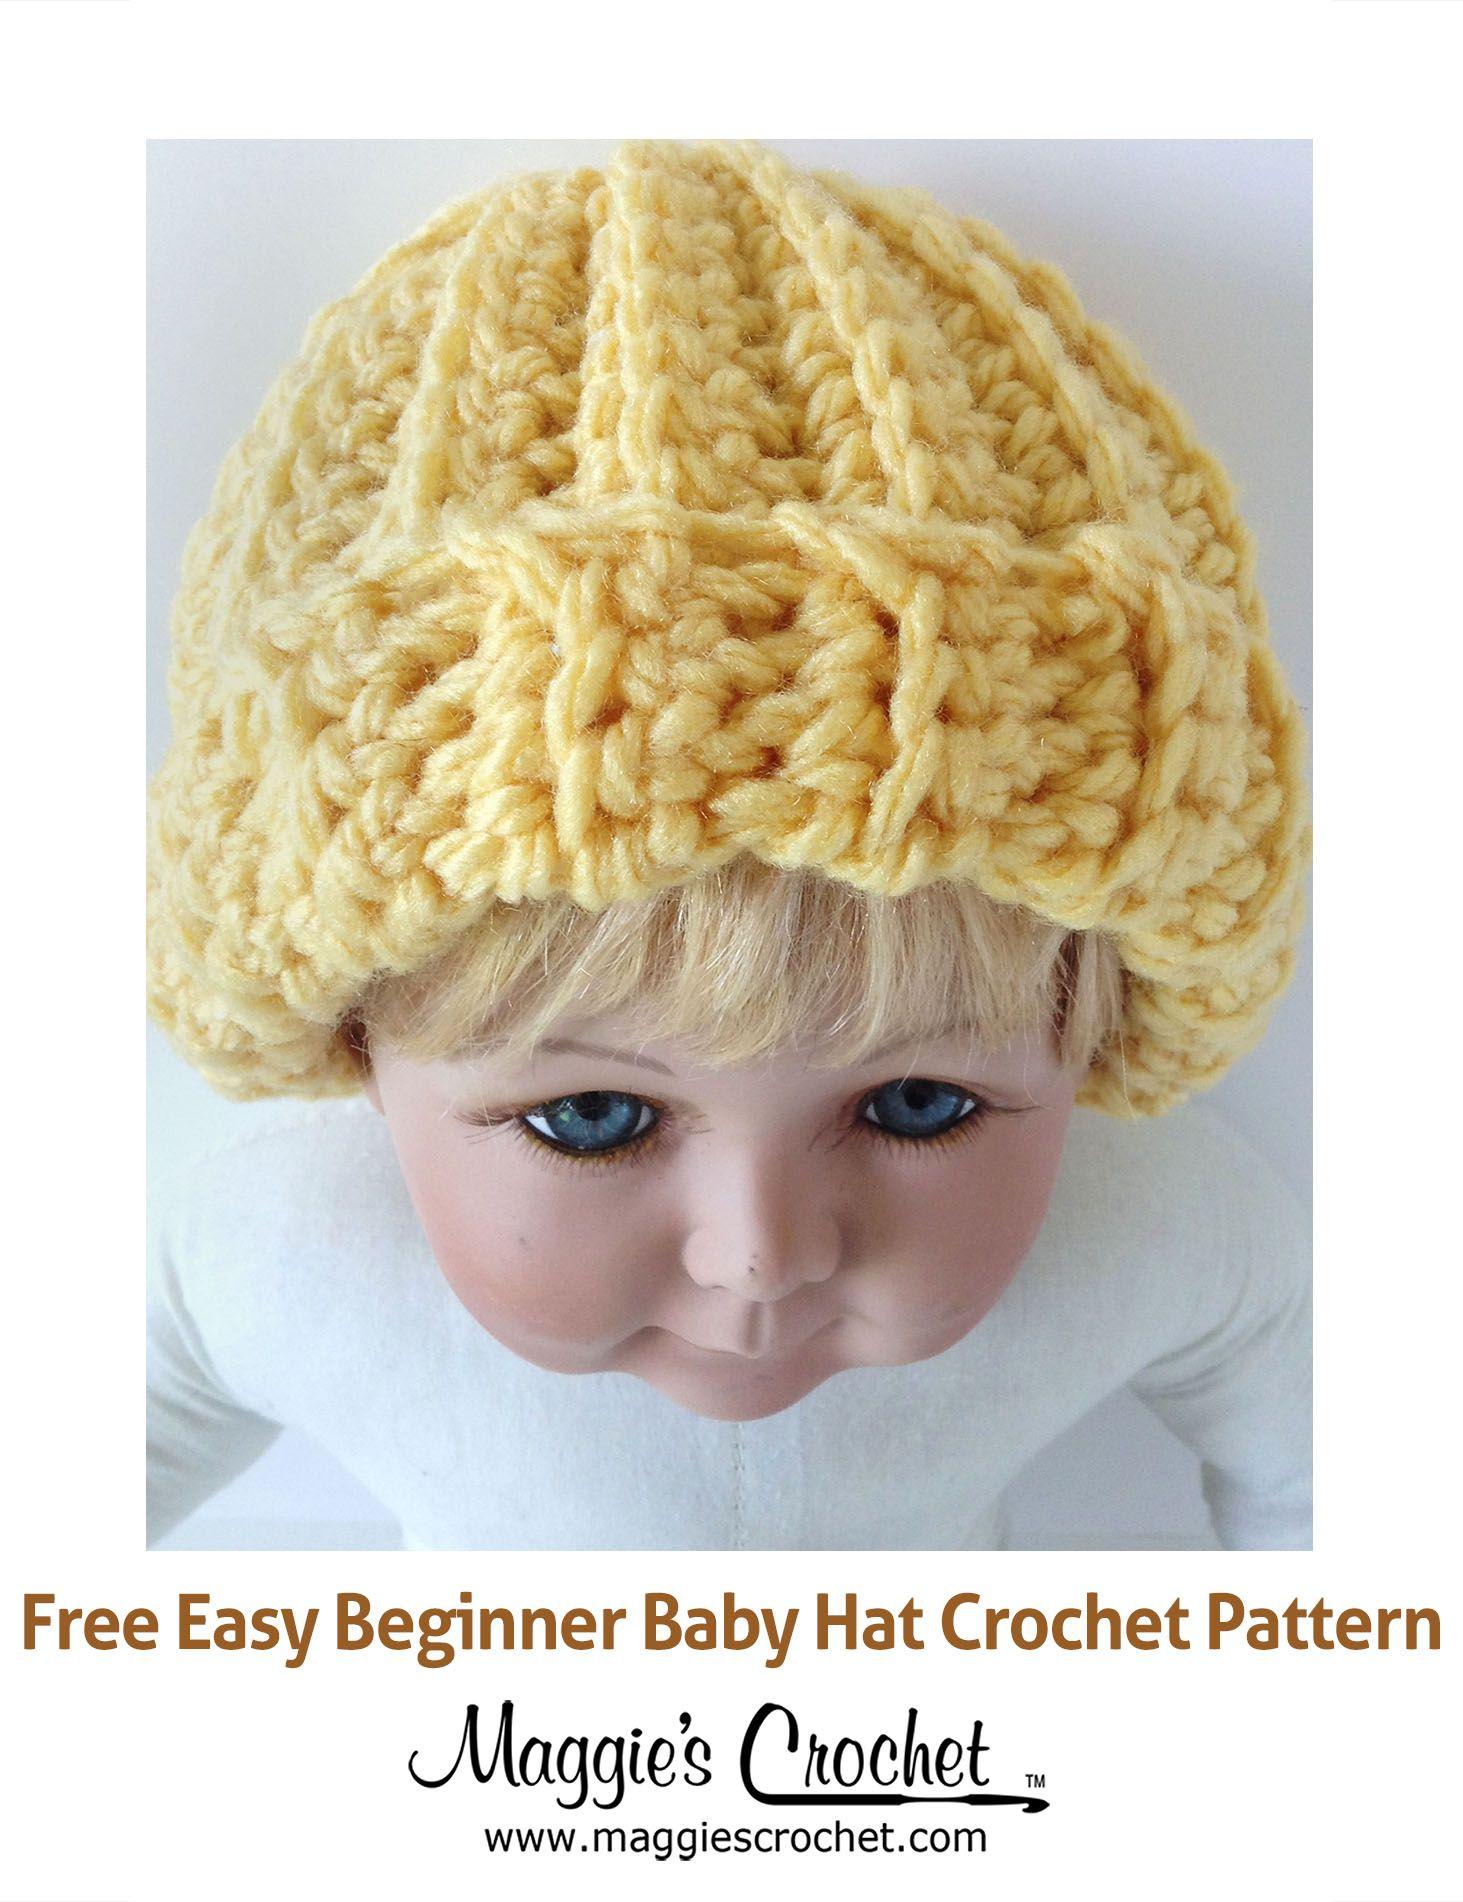 Easy Beginner Baby Hat Free Crochet Pattern from Maggie\'s Crochet ...